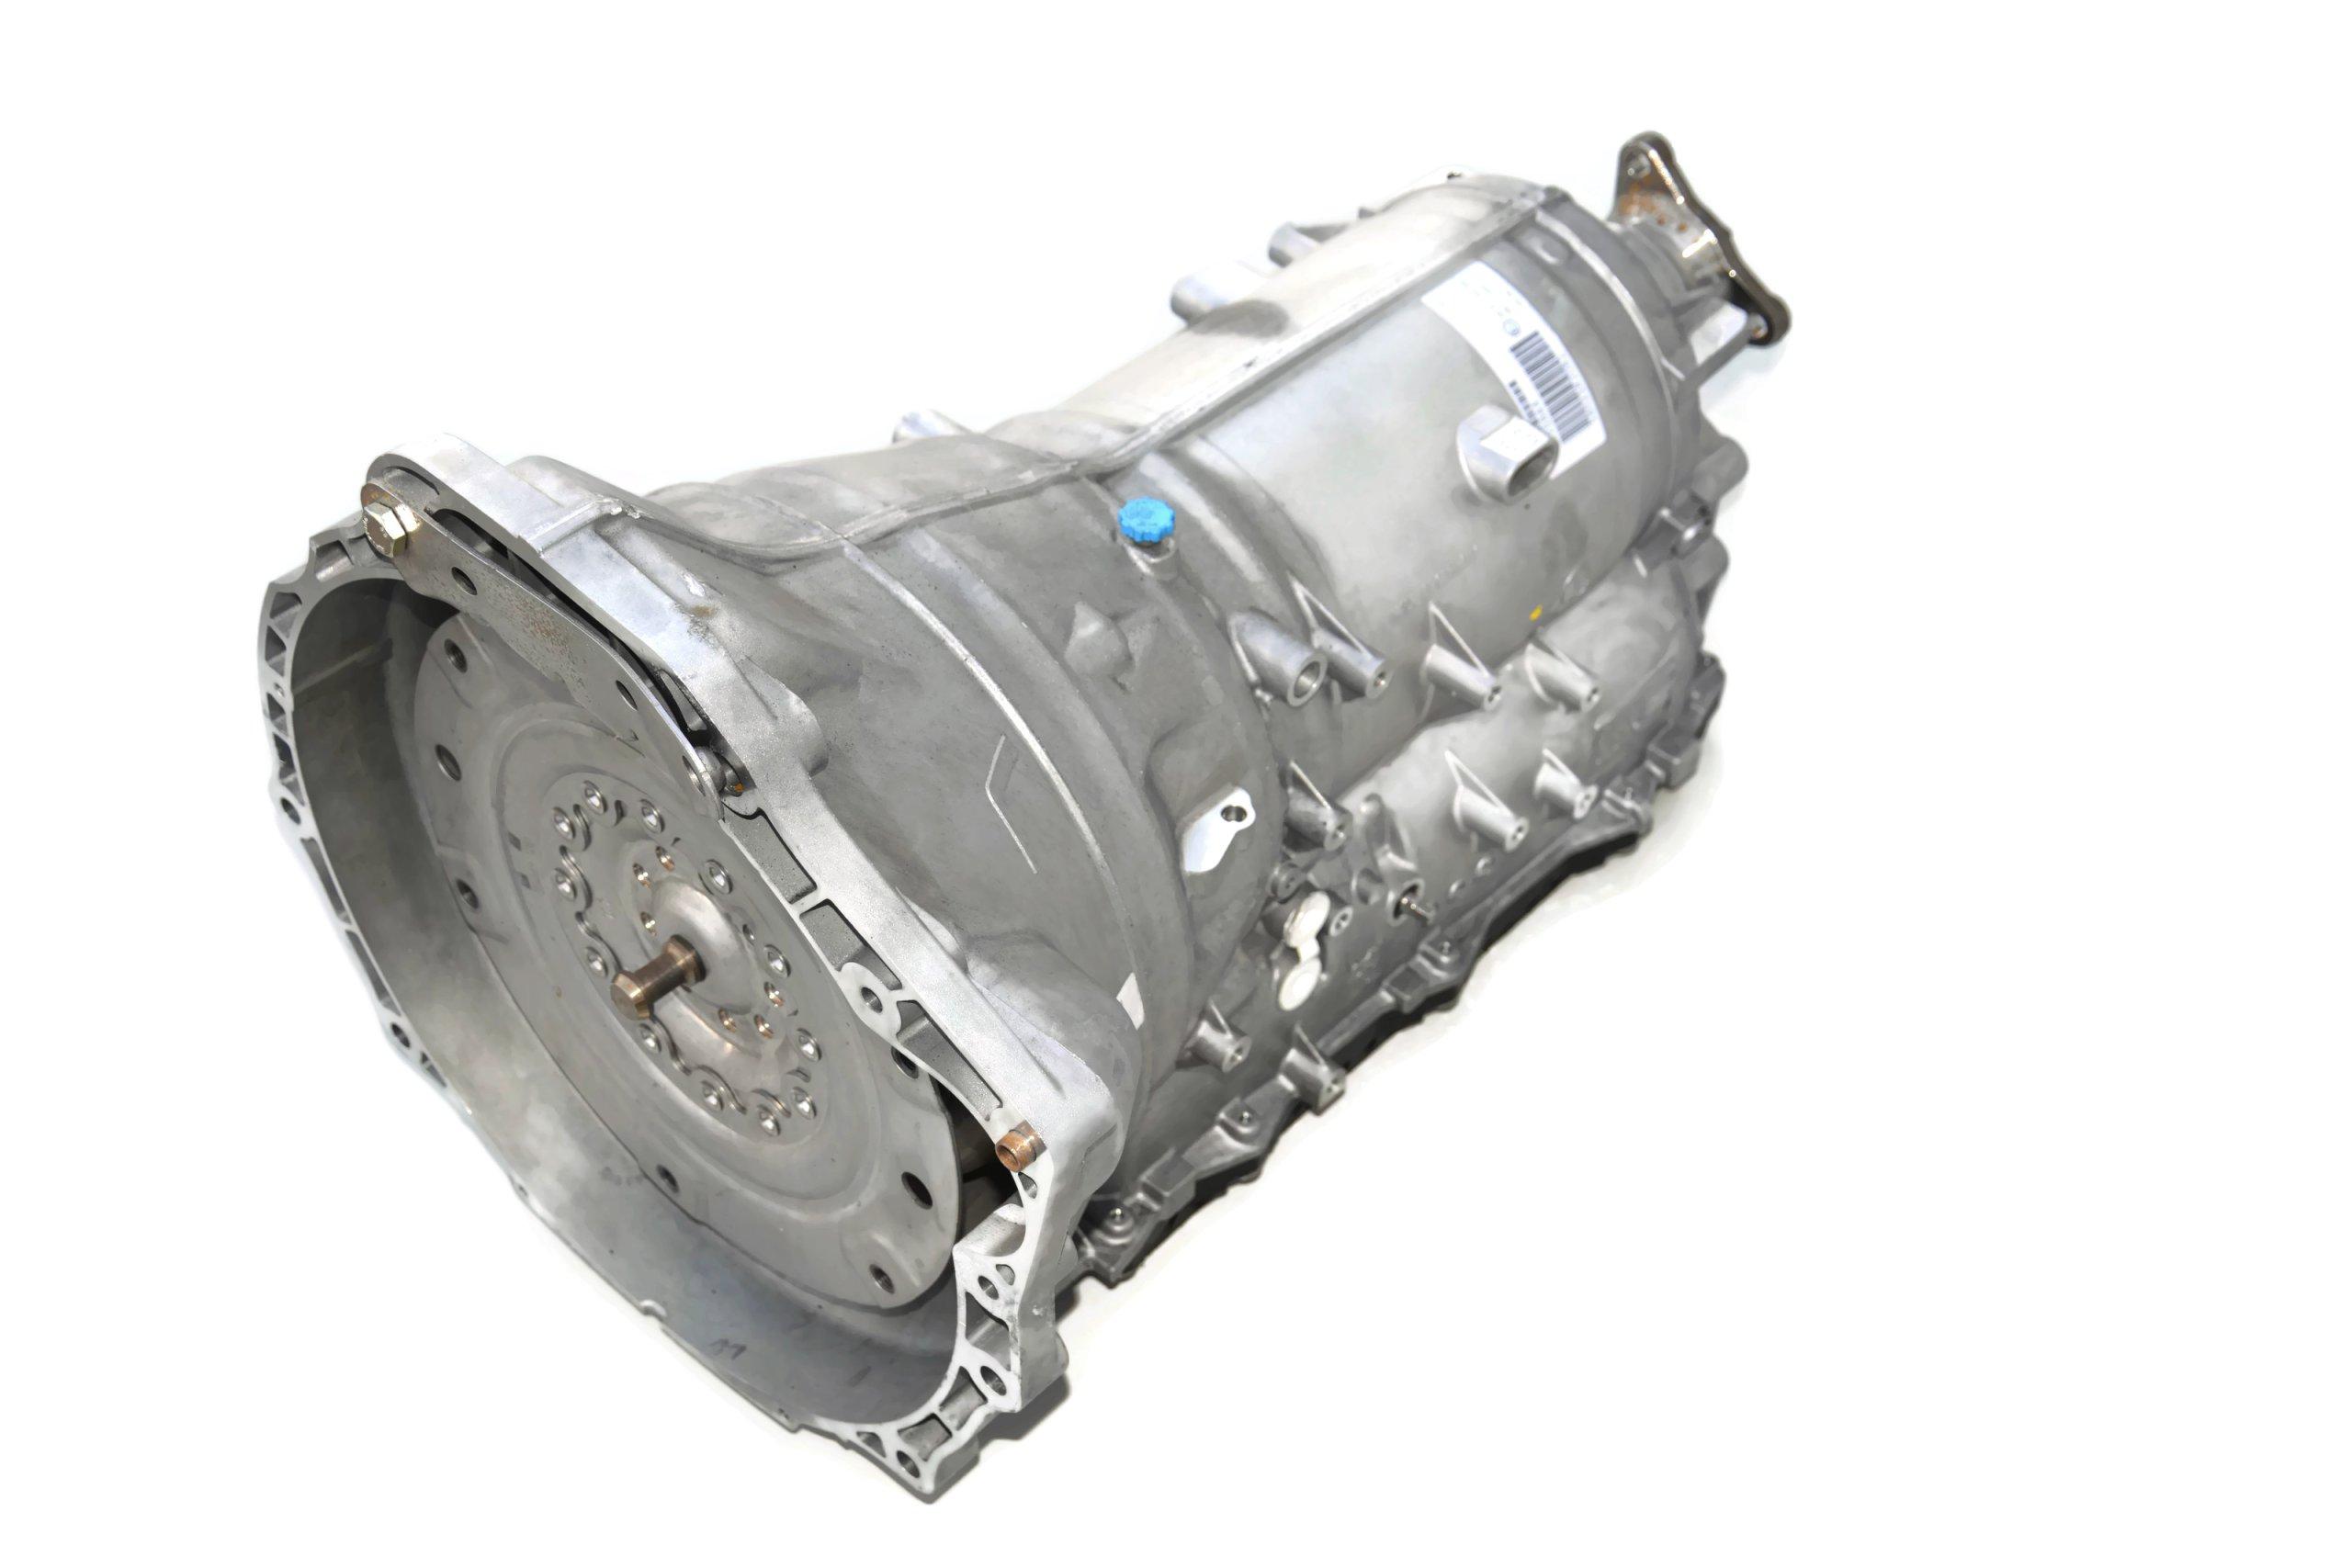 iveco daily коробка передач hi-matic 8-mio ступенчатая